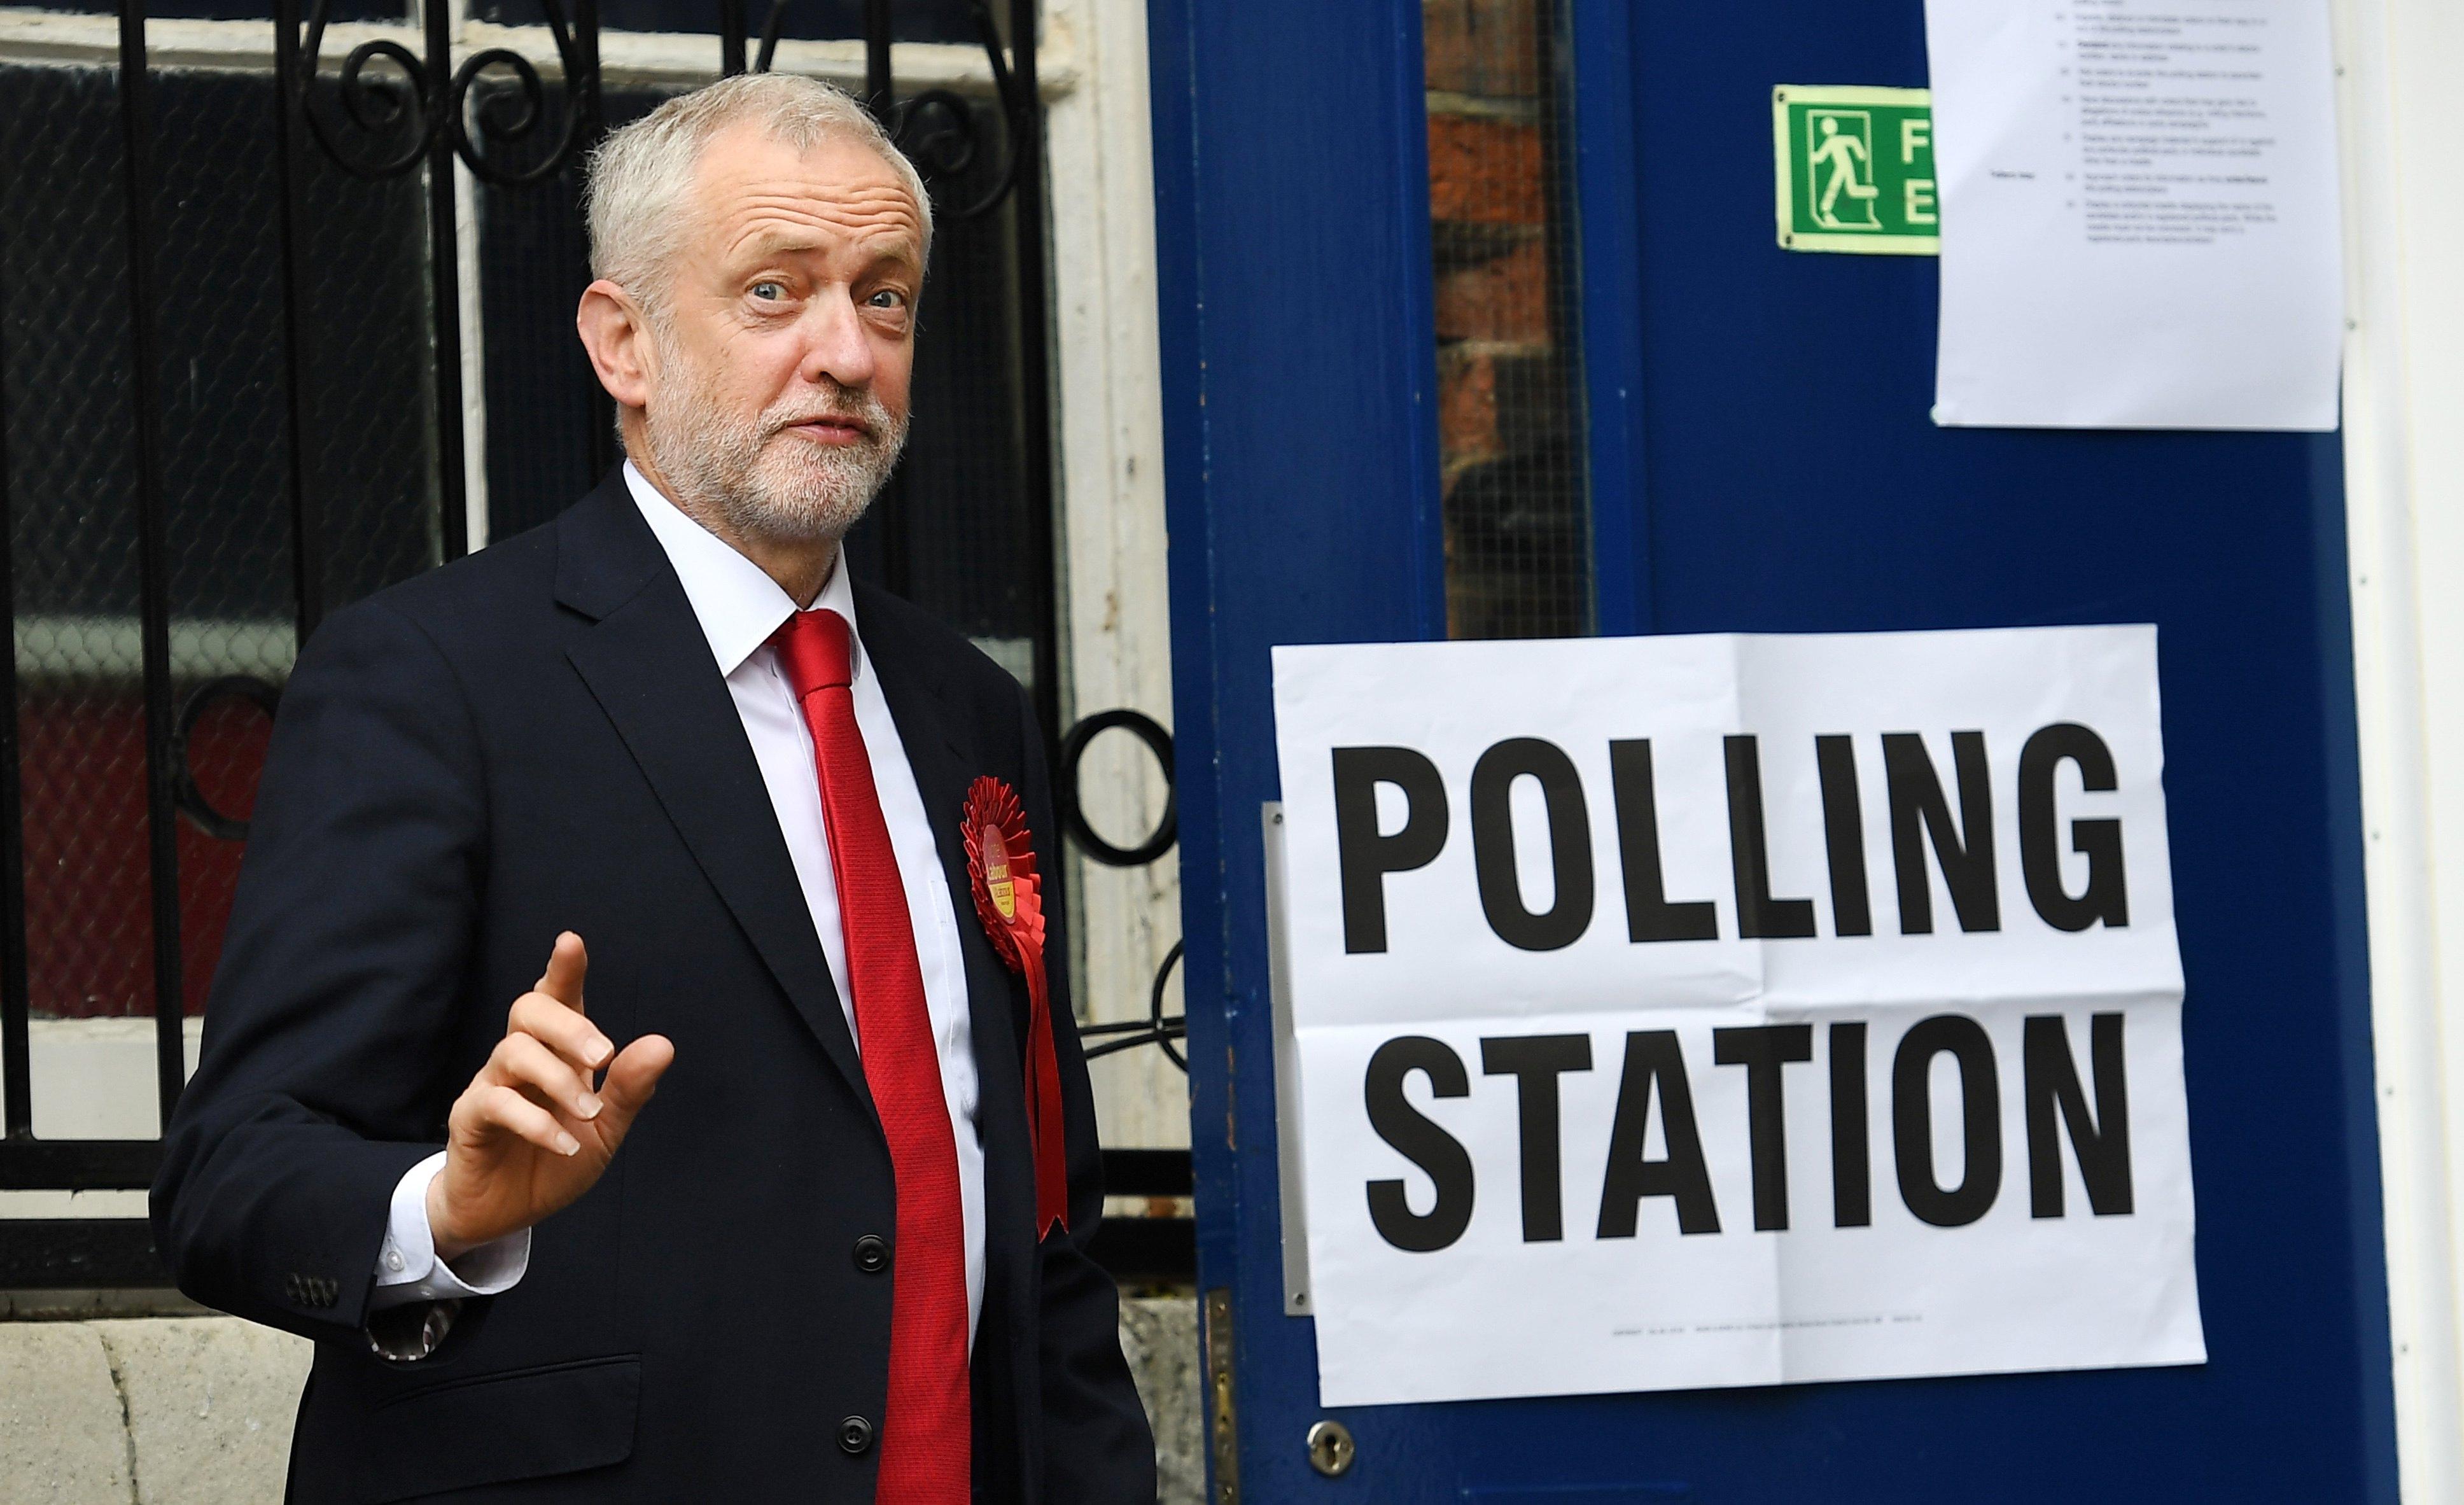 BRITANIJA Konzervativci izgubili većinu u parlamentu